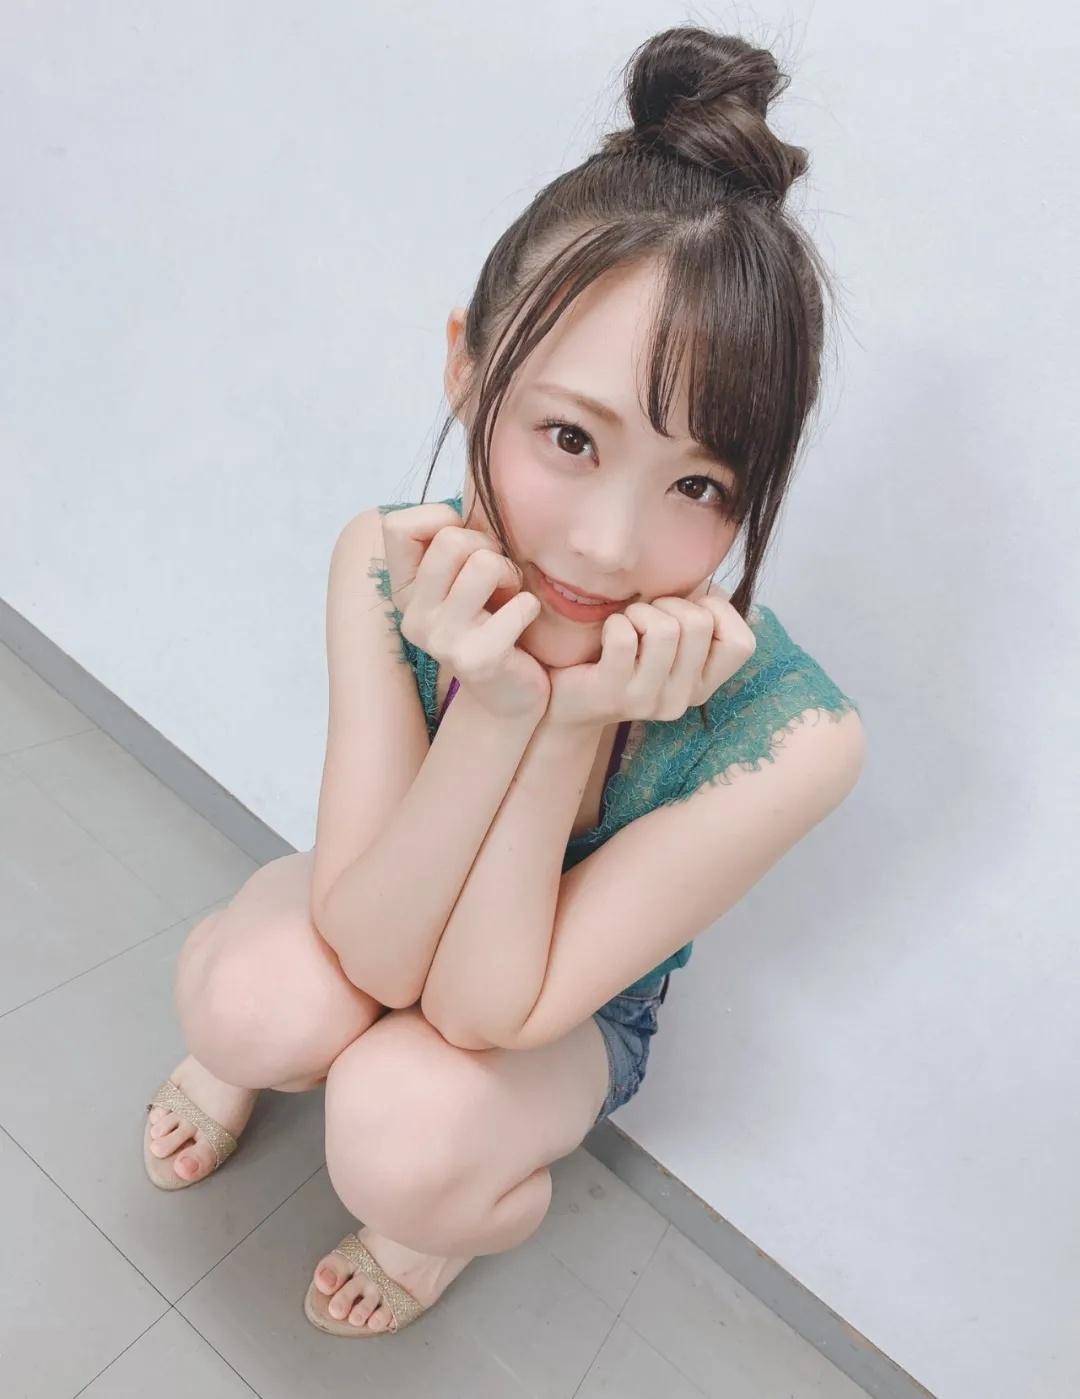 SSNI-629:青春萝莉美少女吉冈日和的成人礼